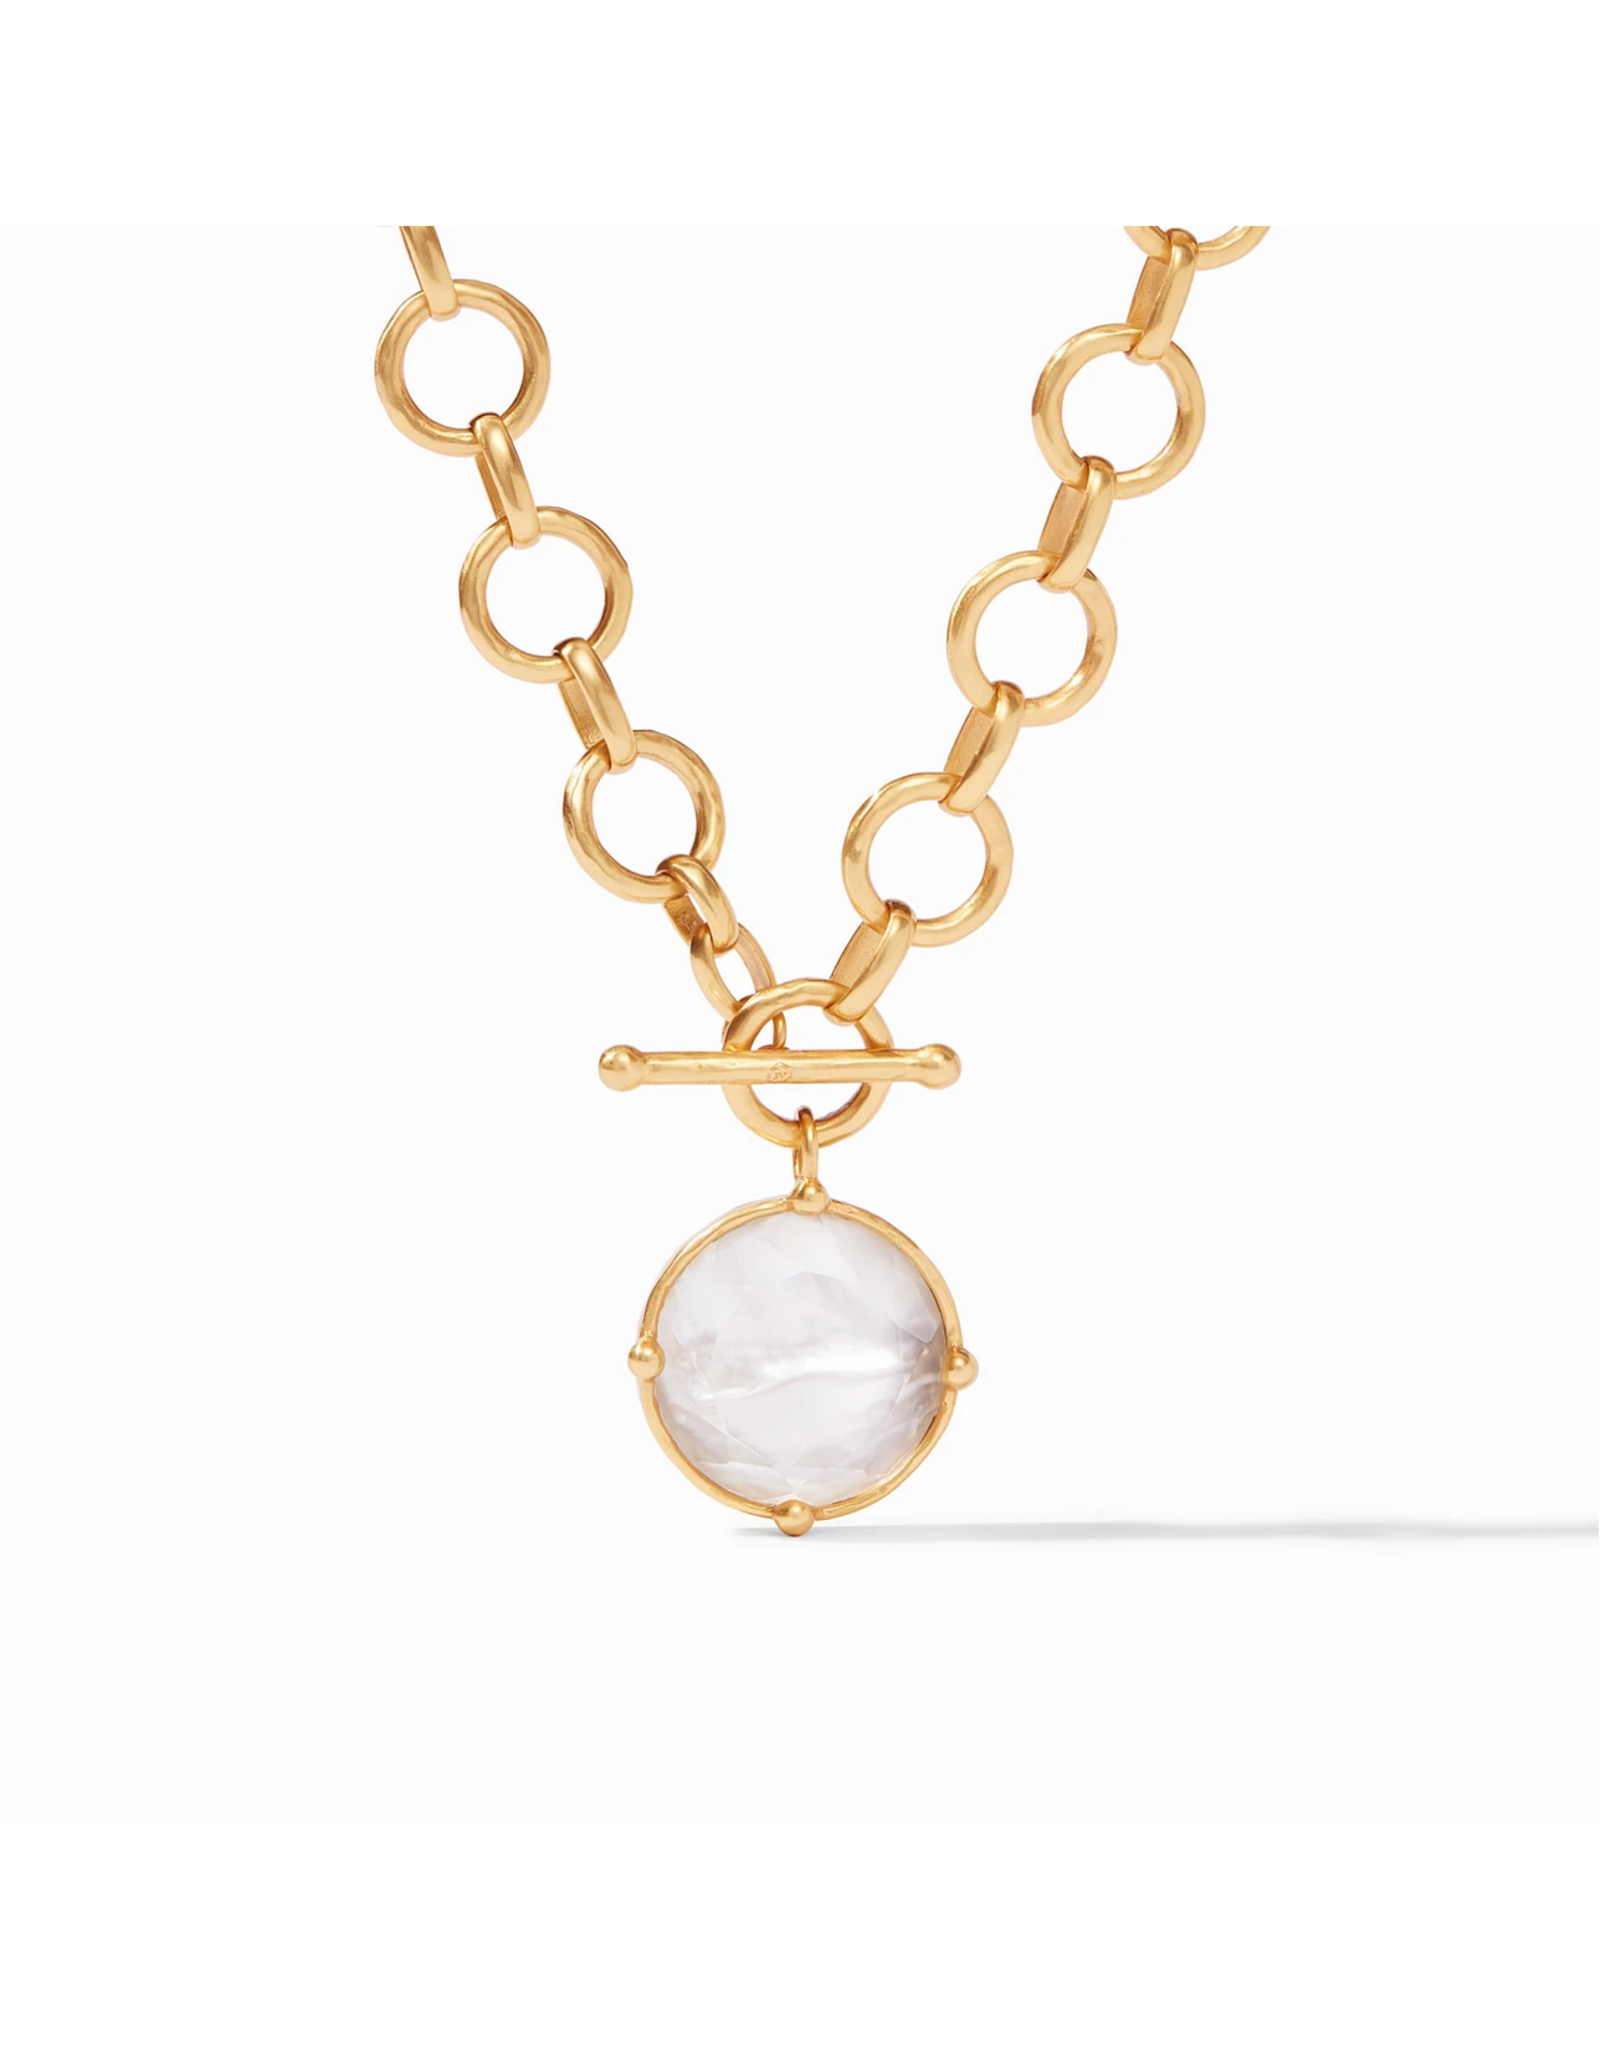 Honeybee Statement Necklace - iridescent clear crystal